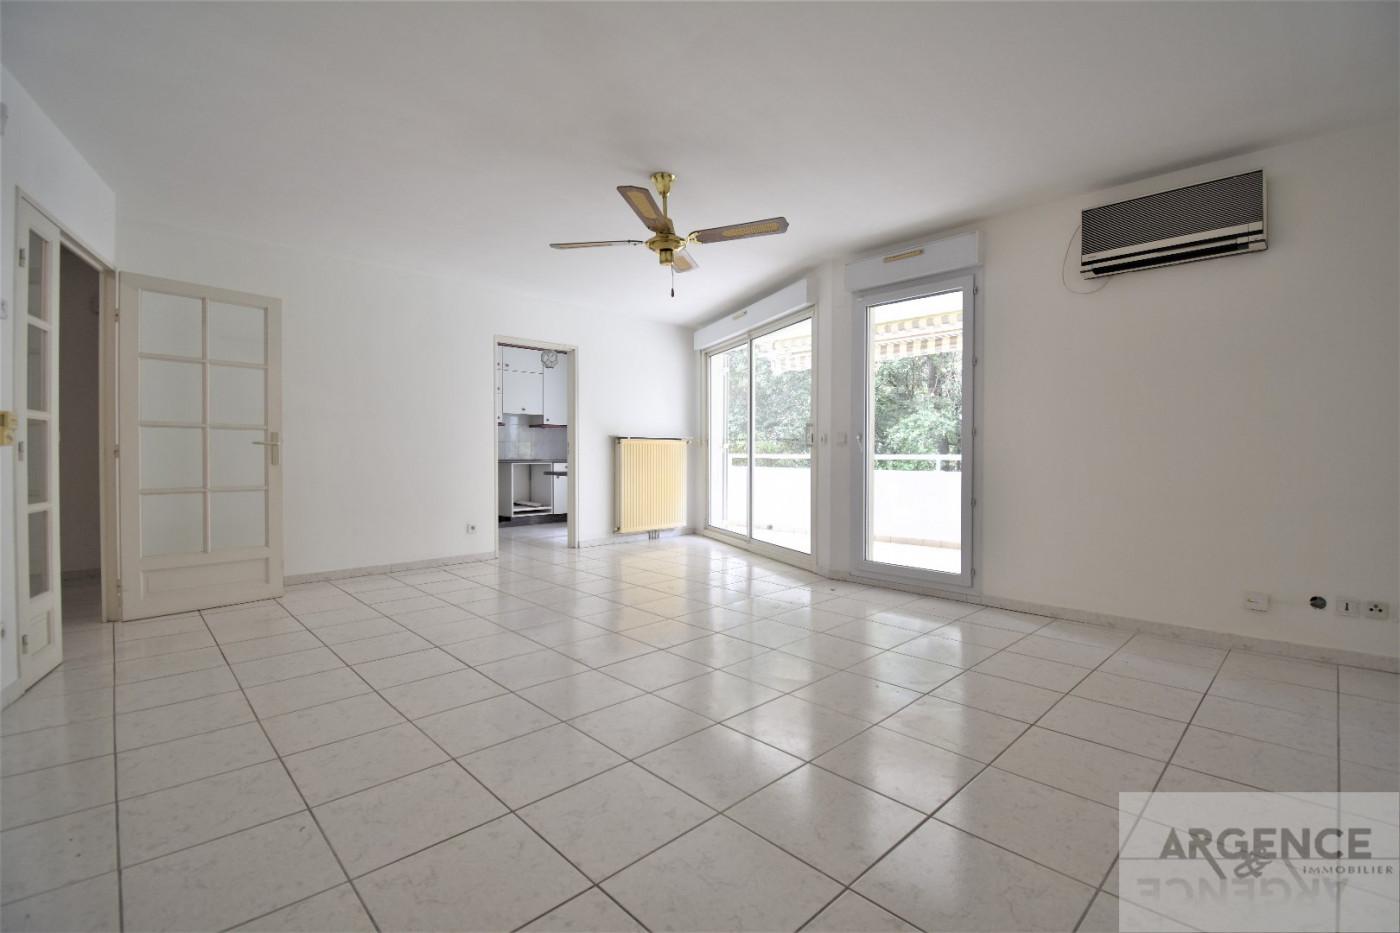 A vendre  Montpellier | Réf 345335765 - Argence immobilier